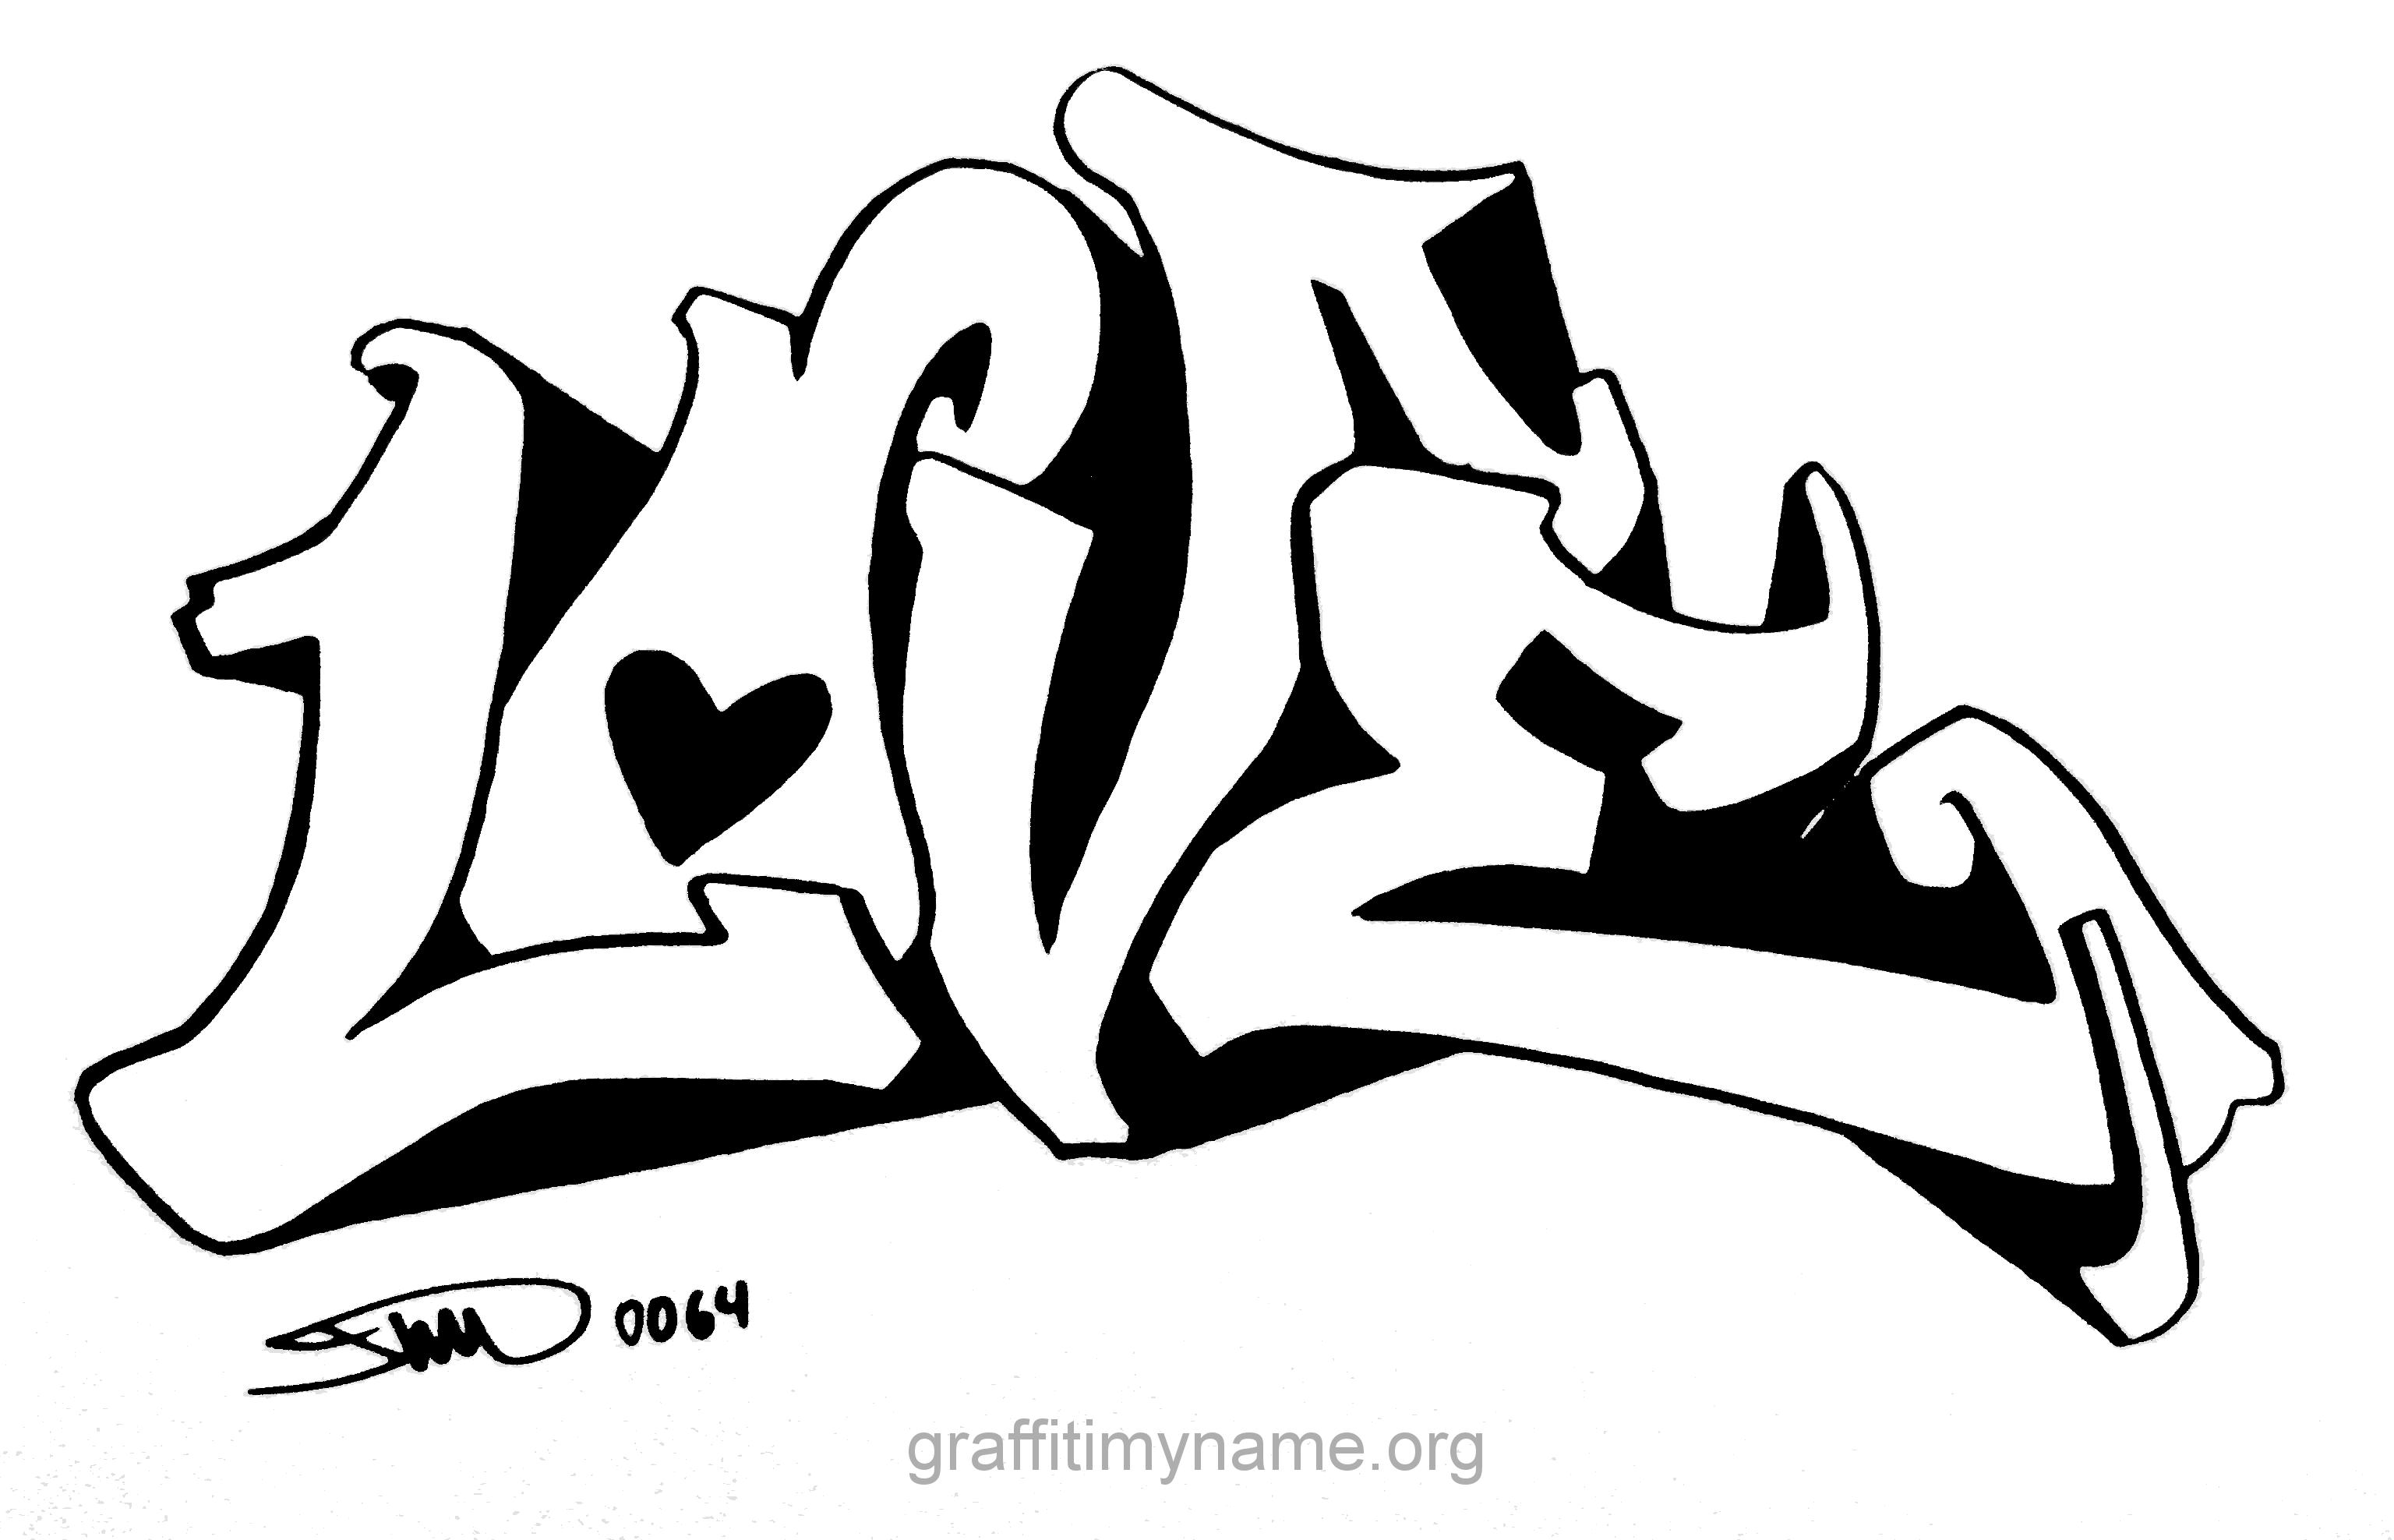 Love Drawings Google Search Easy Graffiti Drawings Word Drawings Easy Graffiti